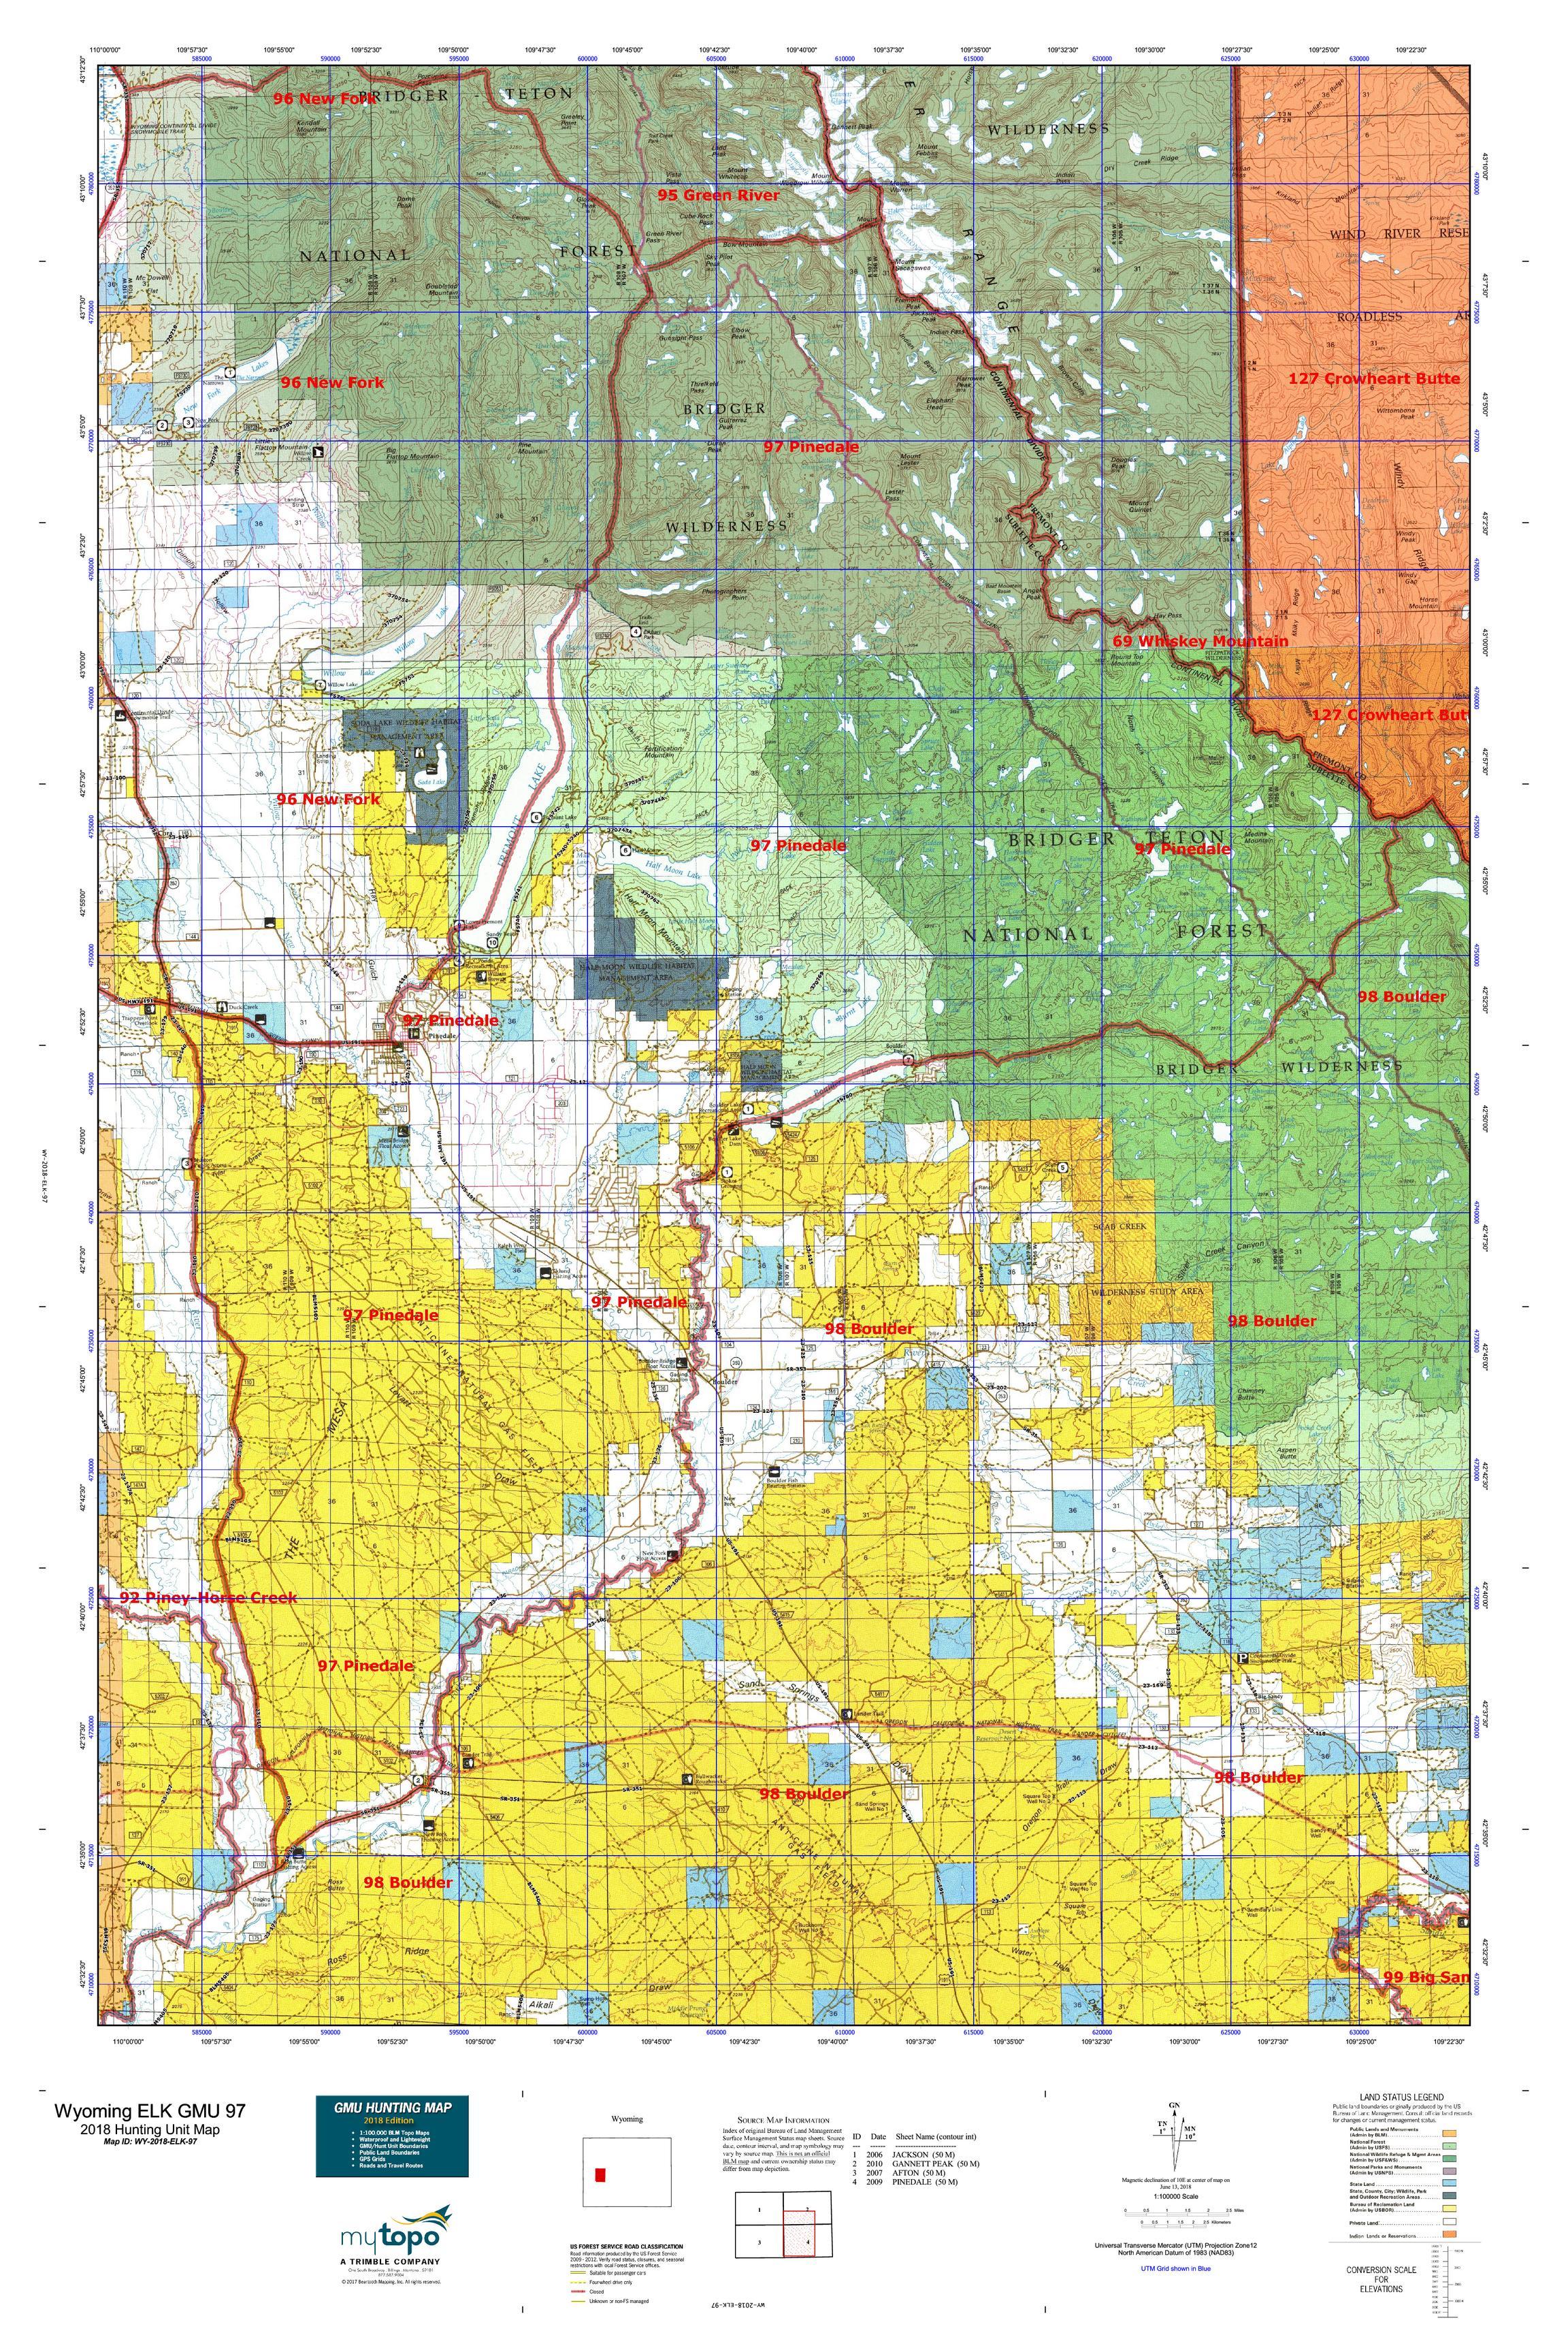 Wyoming ELK GMU 97 Map | MyTopo